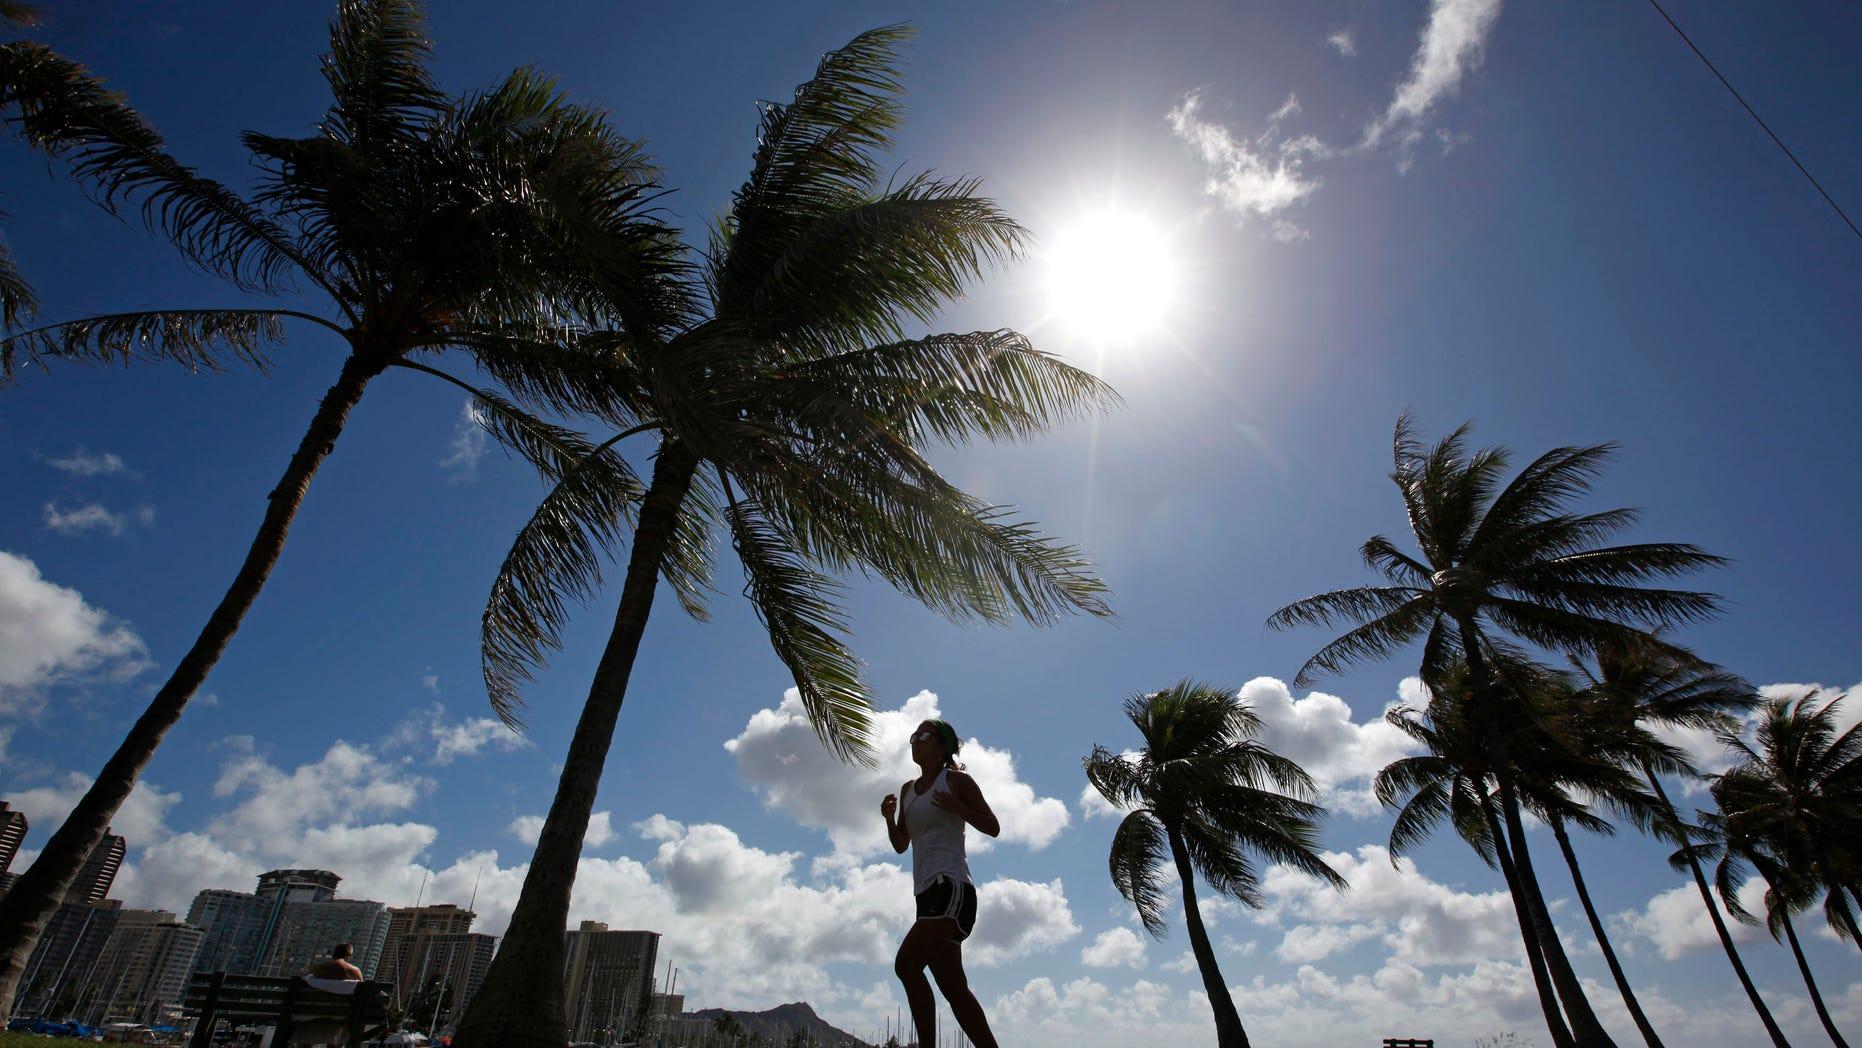 A woman jogs along a path in Ala Moana Park in Honolulu, Hawaii. REUTERS/Jim Young